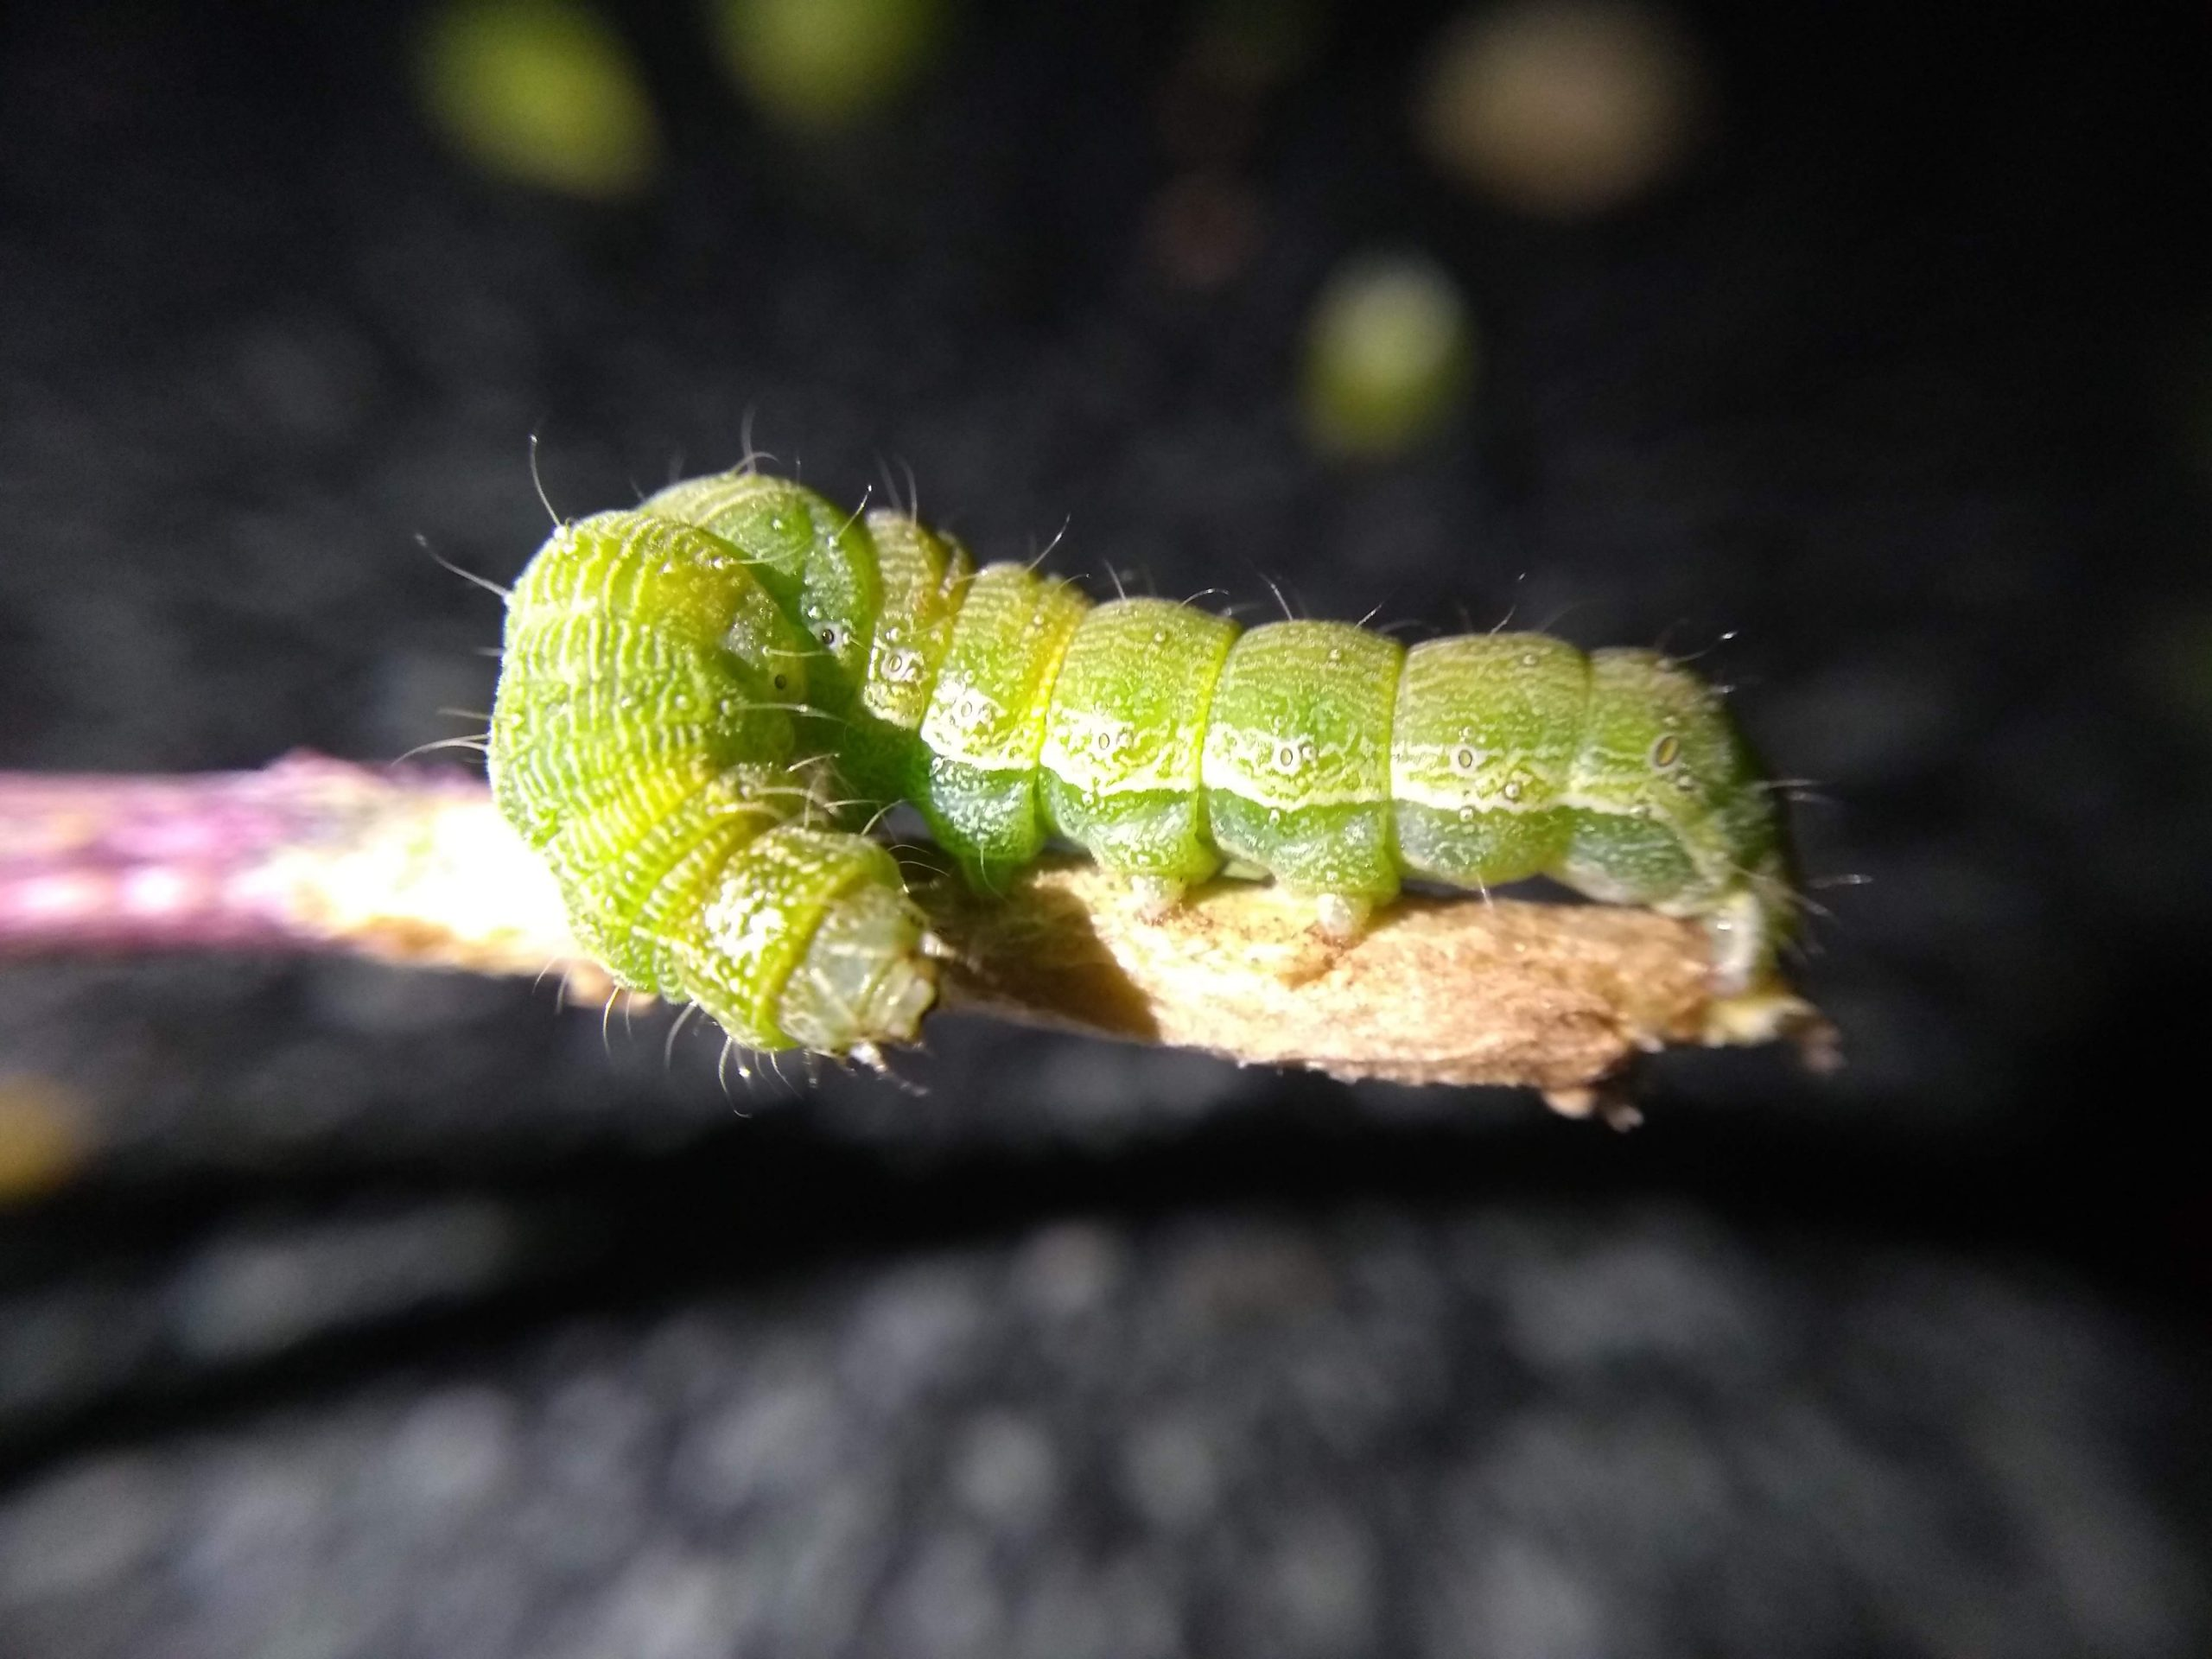 Caterpillar on wood stick